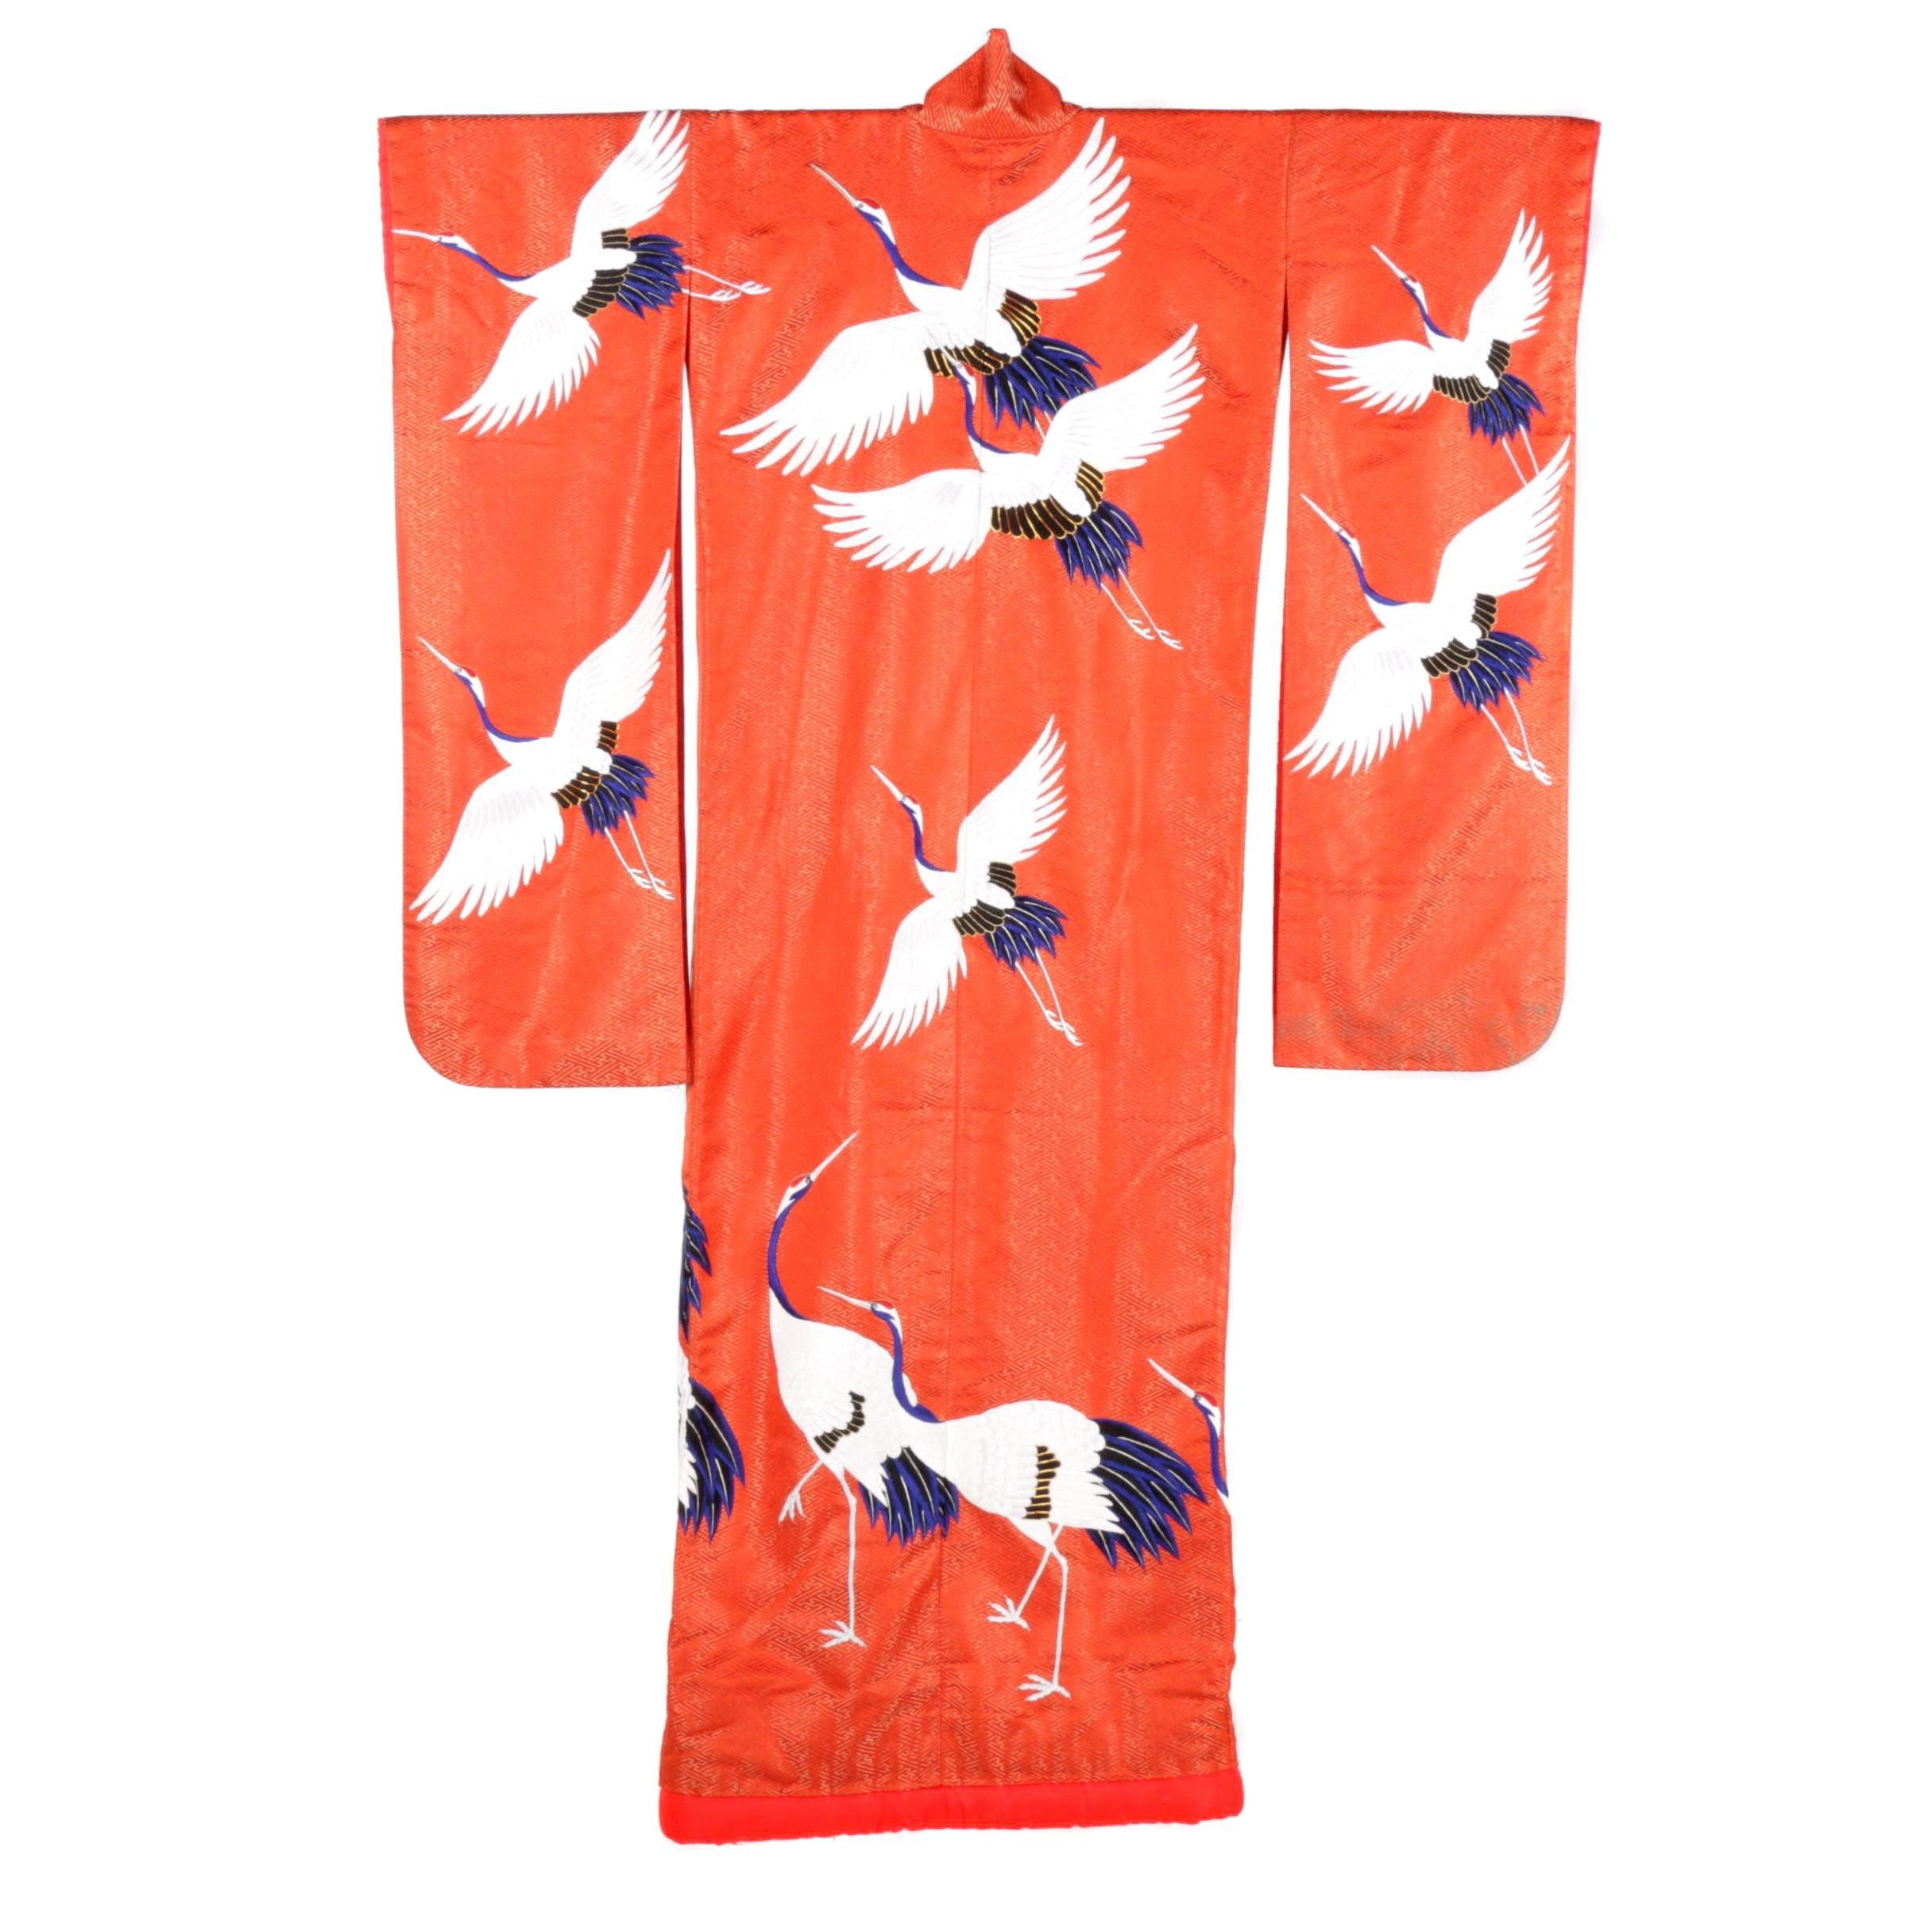 Circa 1950s Vintage Hand Sewn Silk Satin Uchikake Kimono